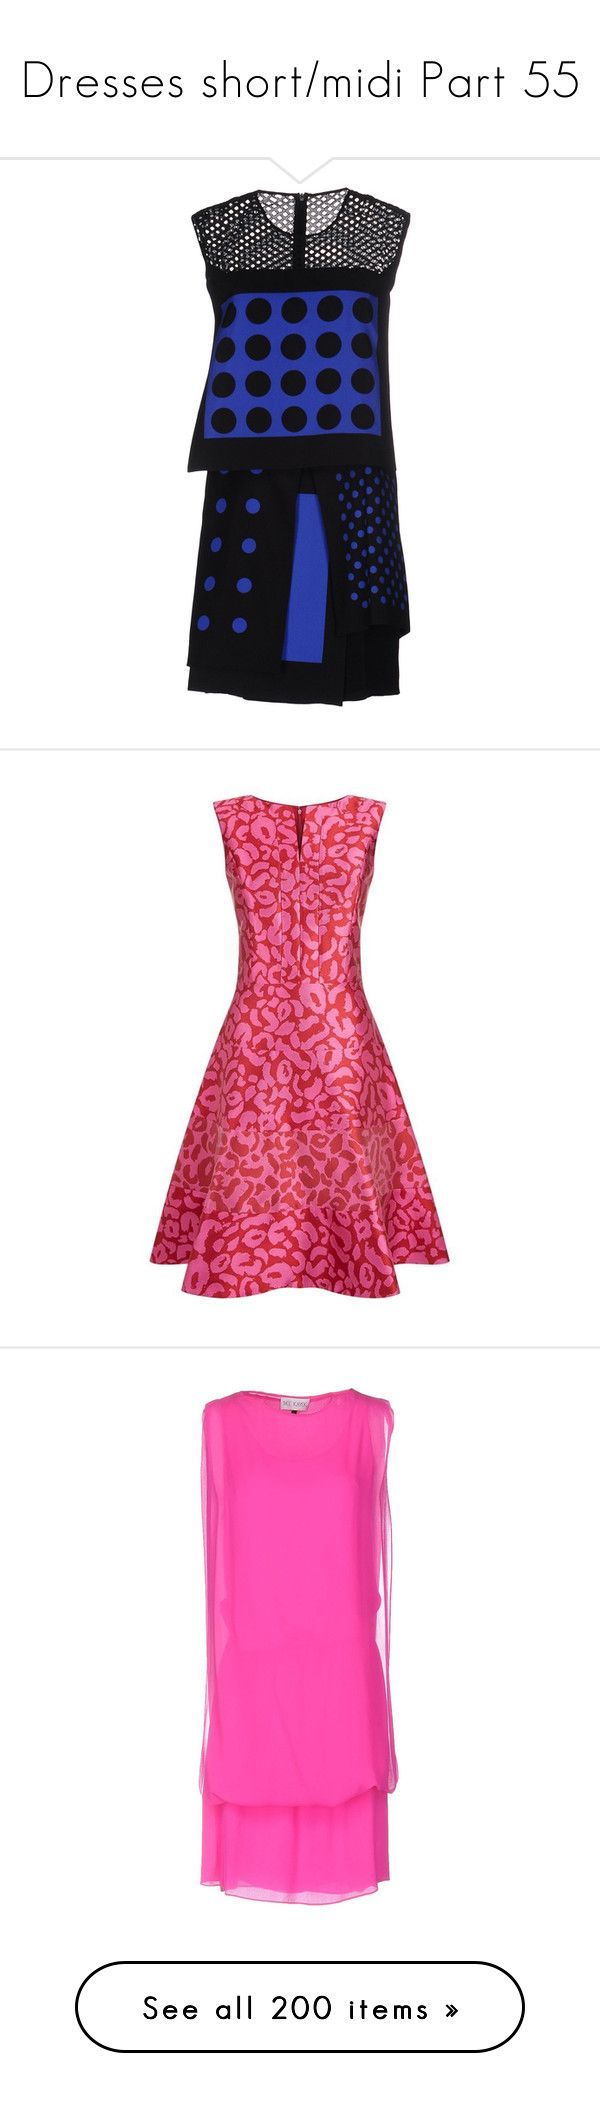 """Dresses short/midi Part 55"" by leanne-mcclean ❤ liked on Polyvore featuring dresses, black, mini tube dress, sleeveless dress, short tube dress, zipper dress, zipper mini dress, oscar de la renta dresses, circle skirt and jacquard dress"